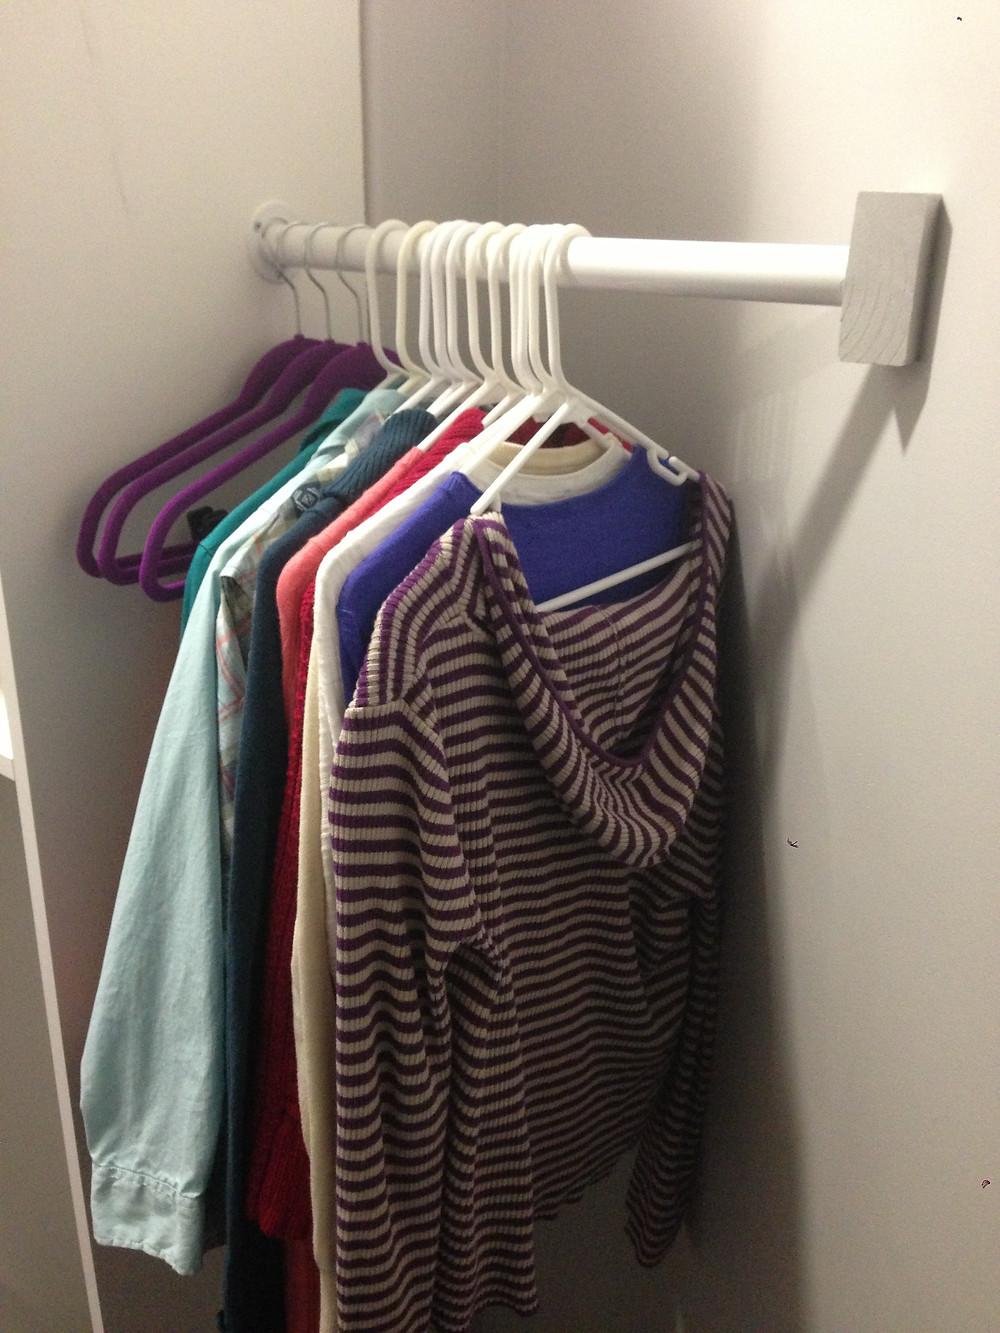 Chloe's corner closet